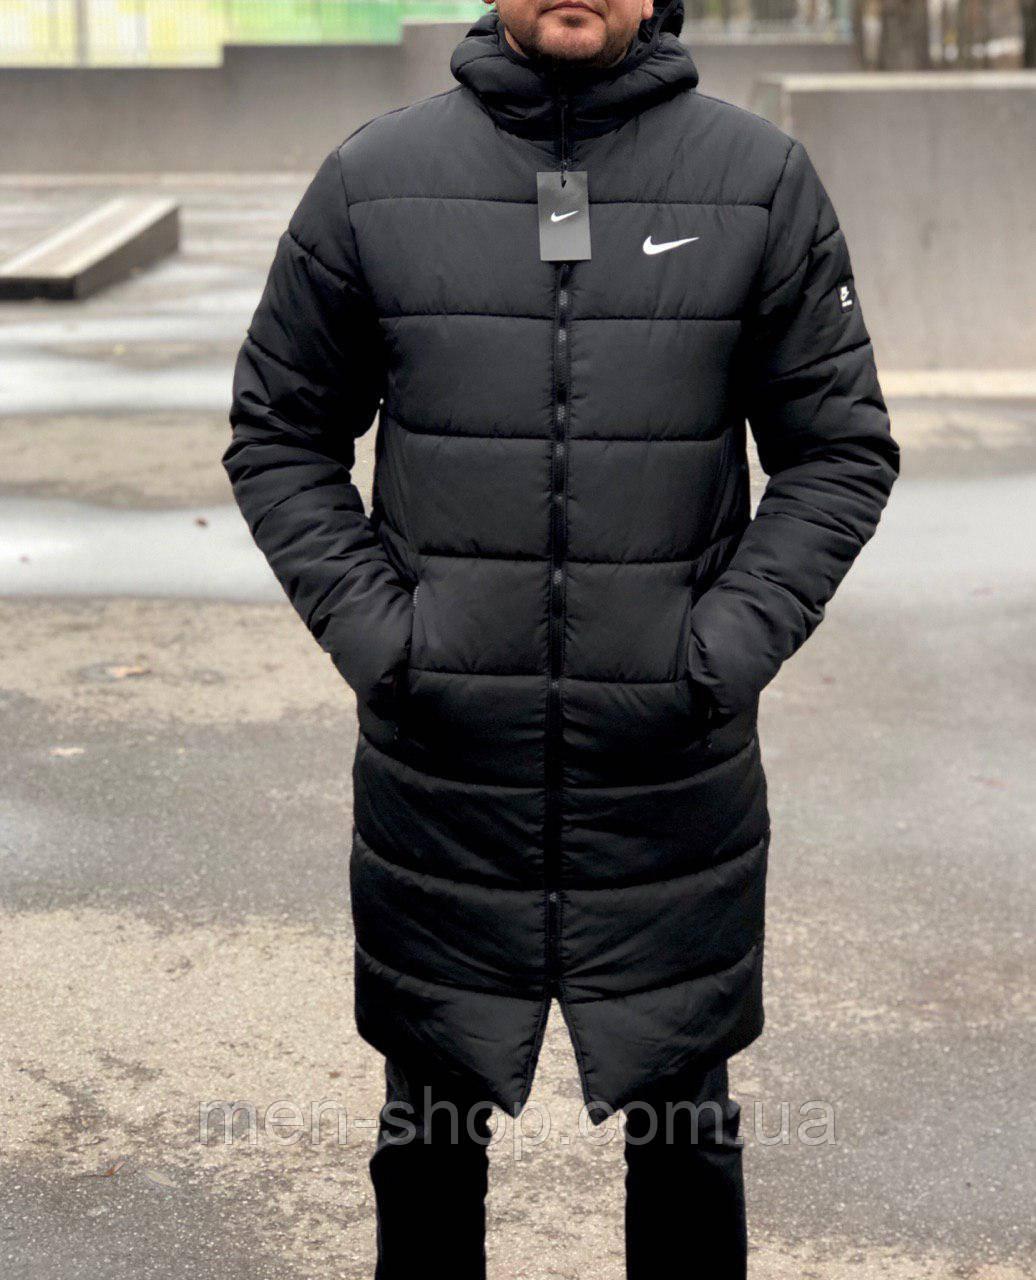 Мужская куртка зимняя в стиле Nike